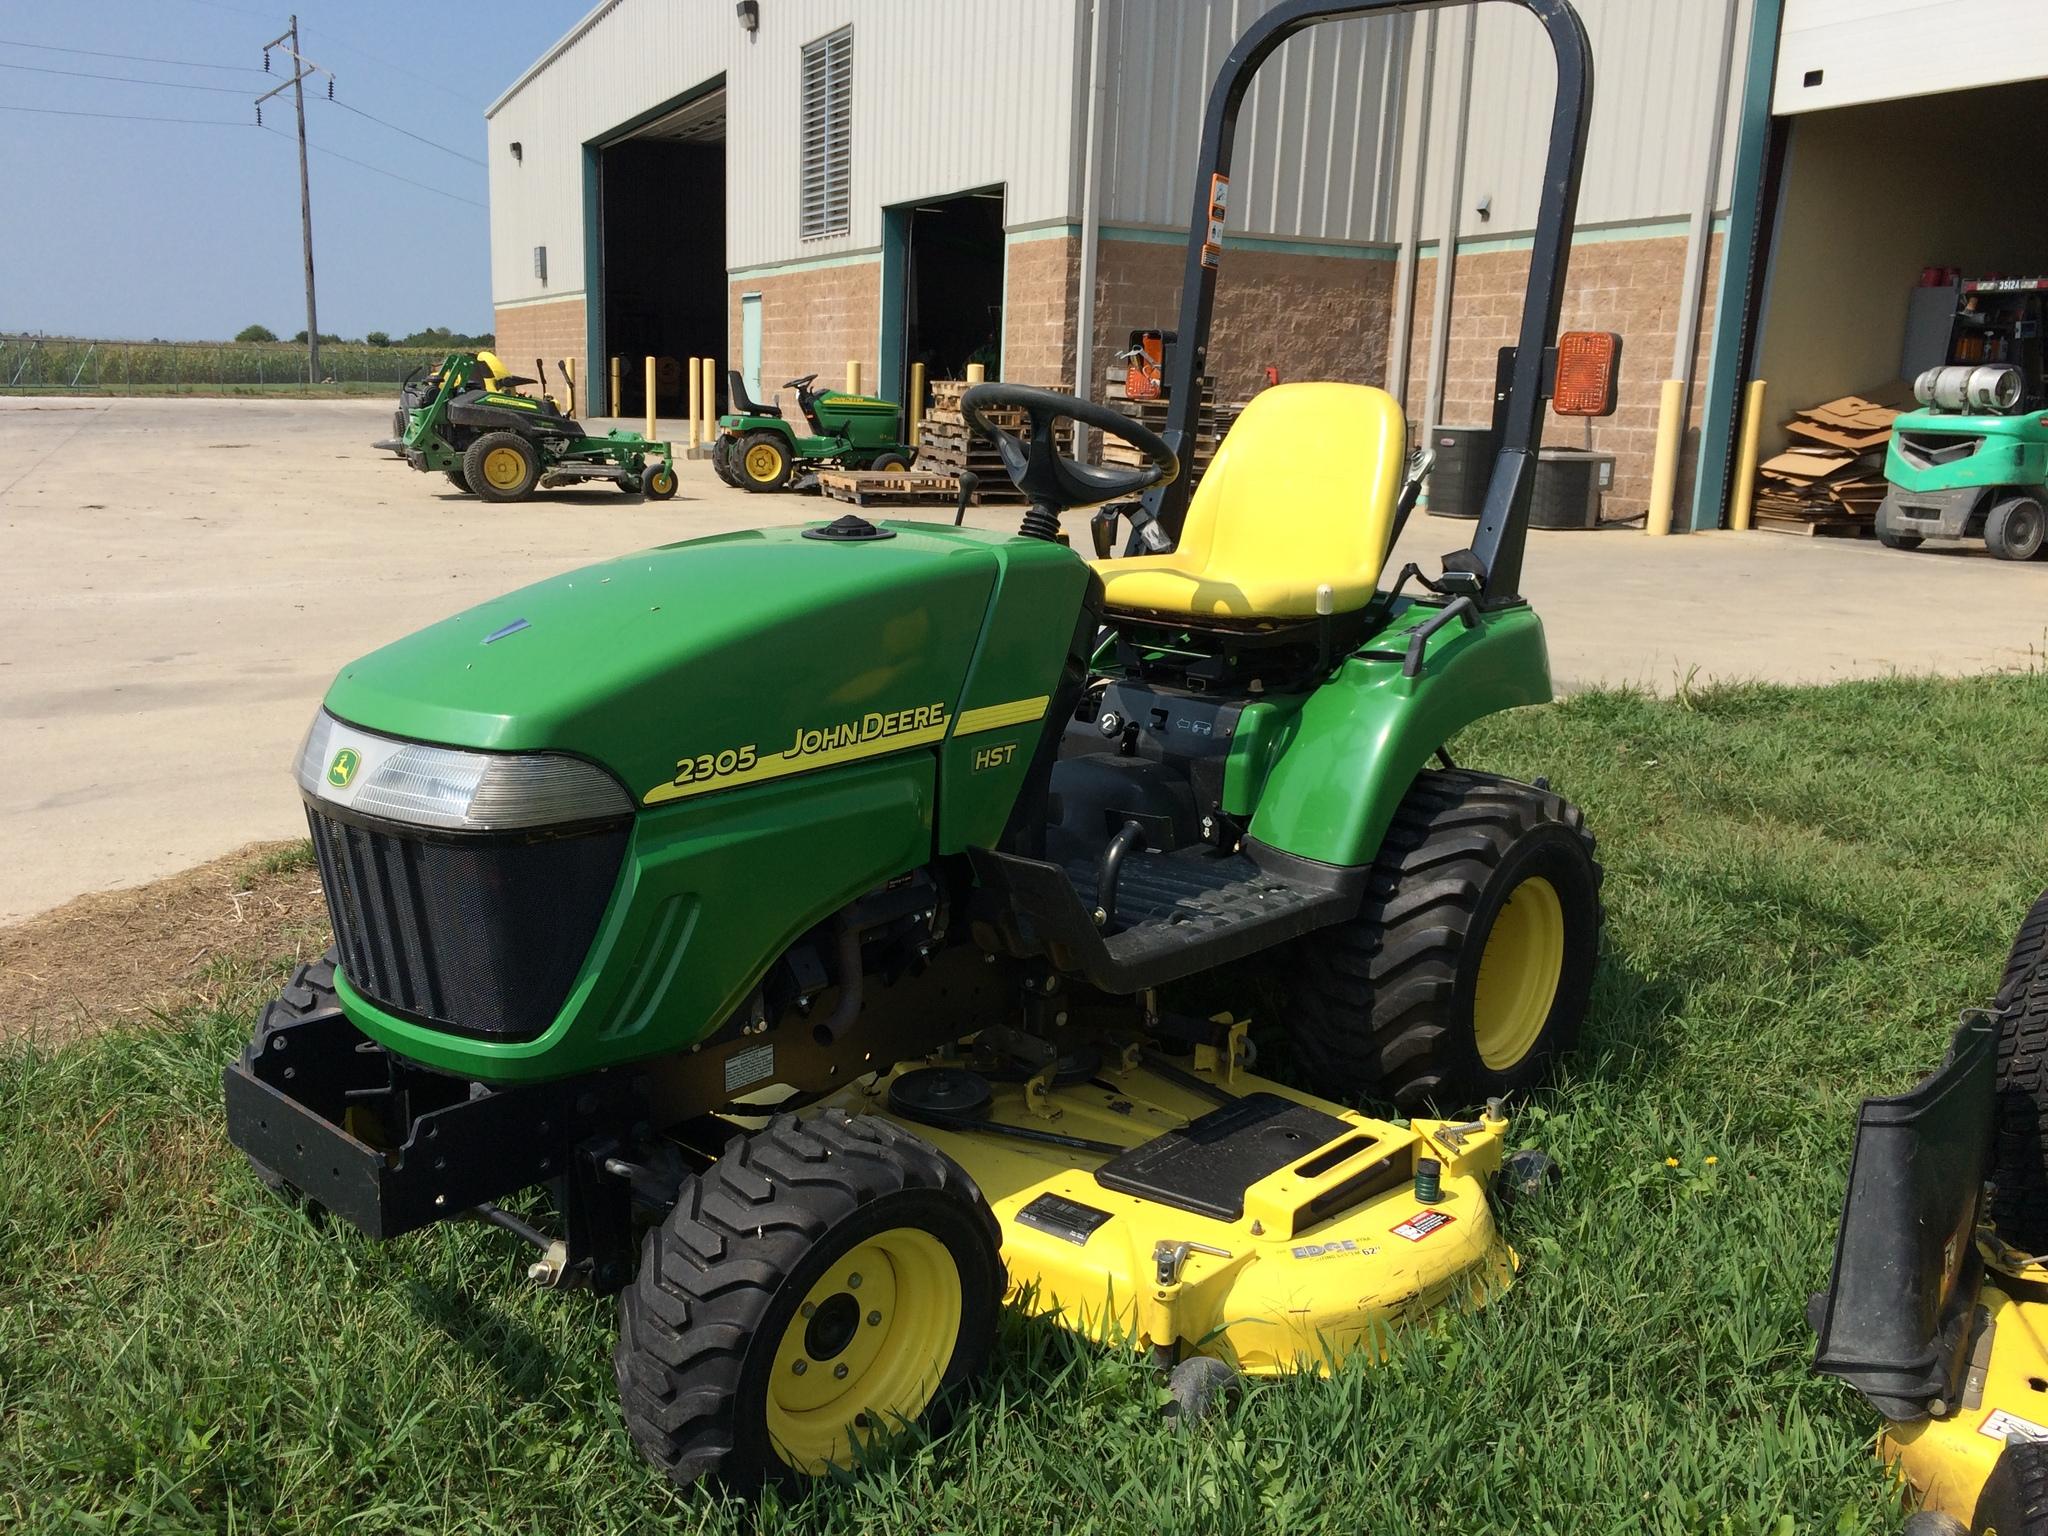 John Deere 2305 Compact Utility Tractors for Sale | [58420]